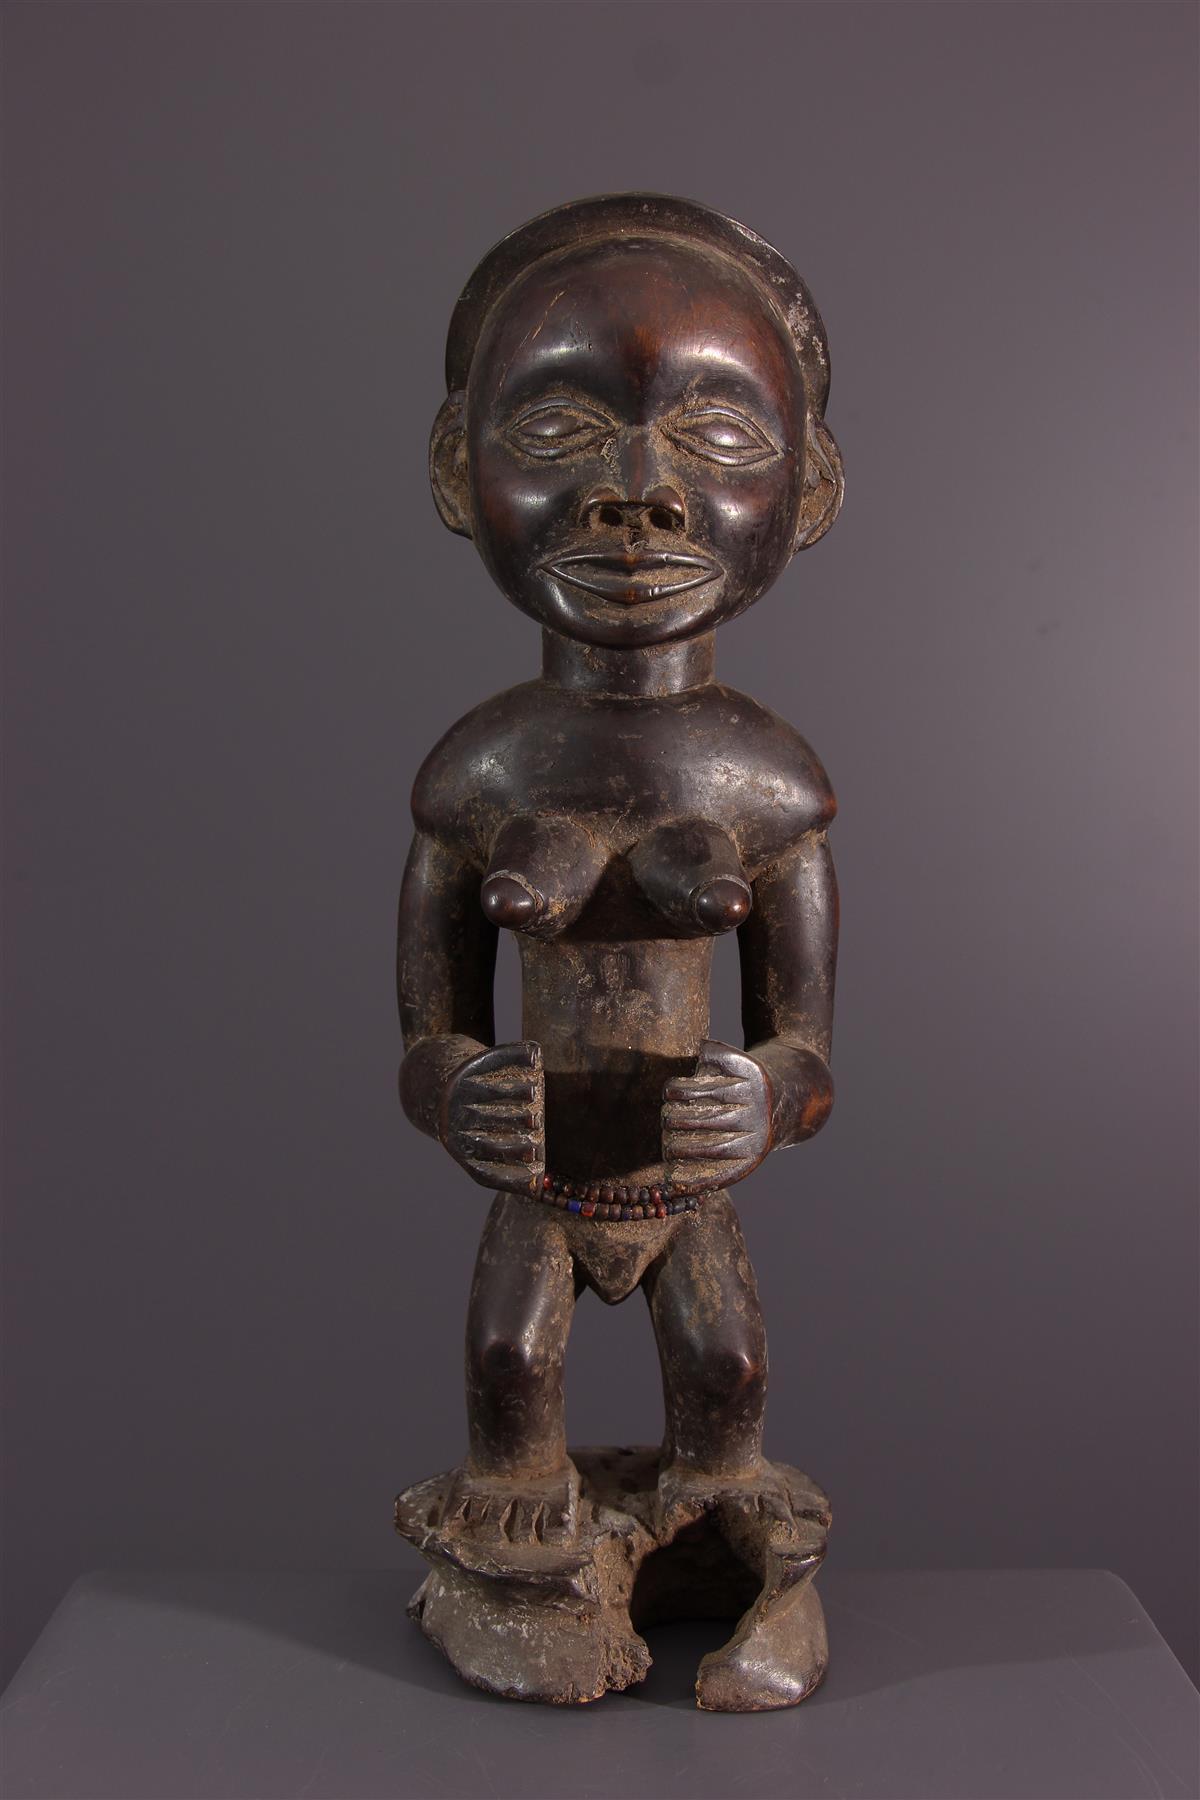 Tschokwe statue - Tribal art